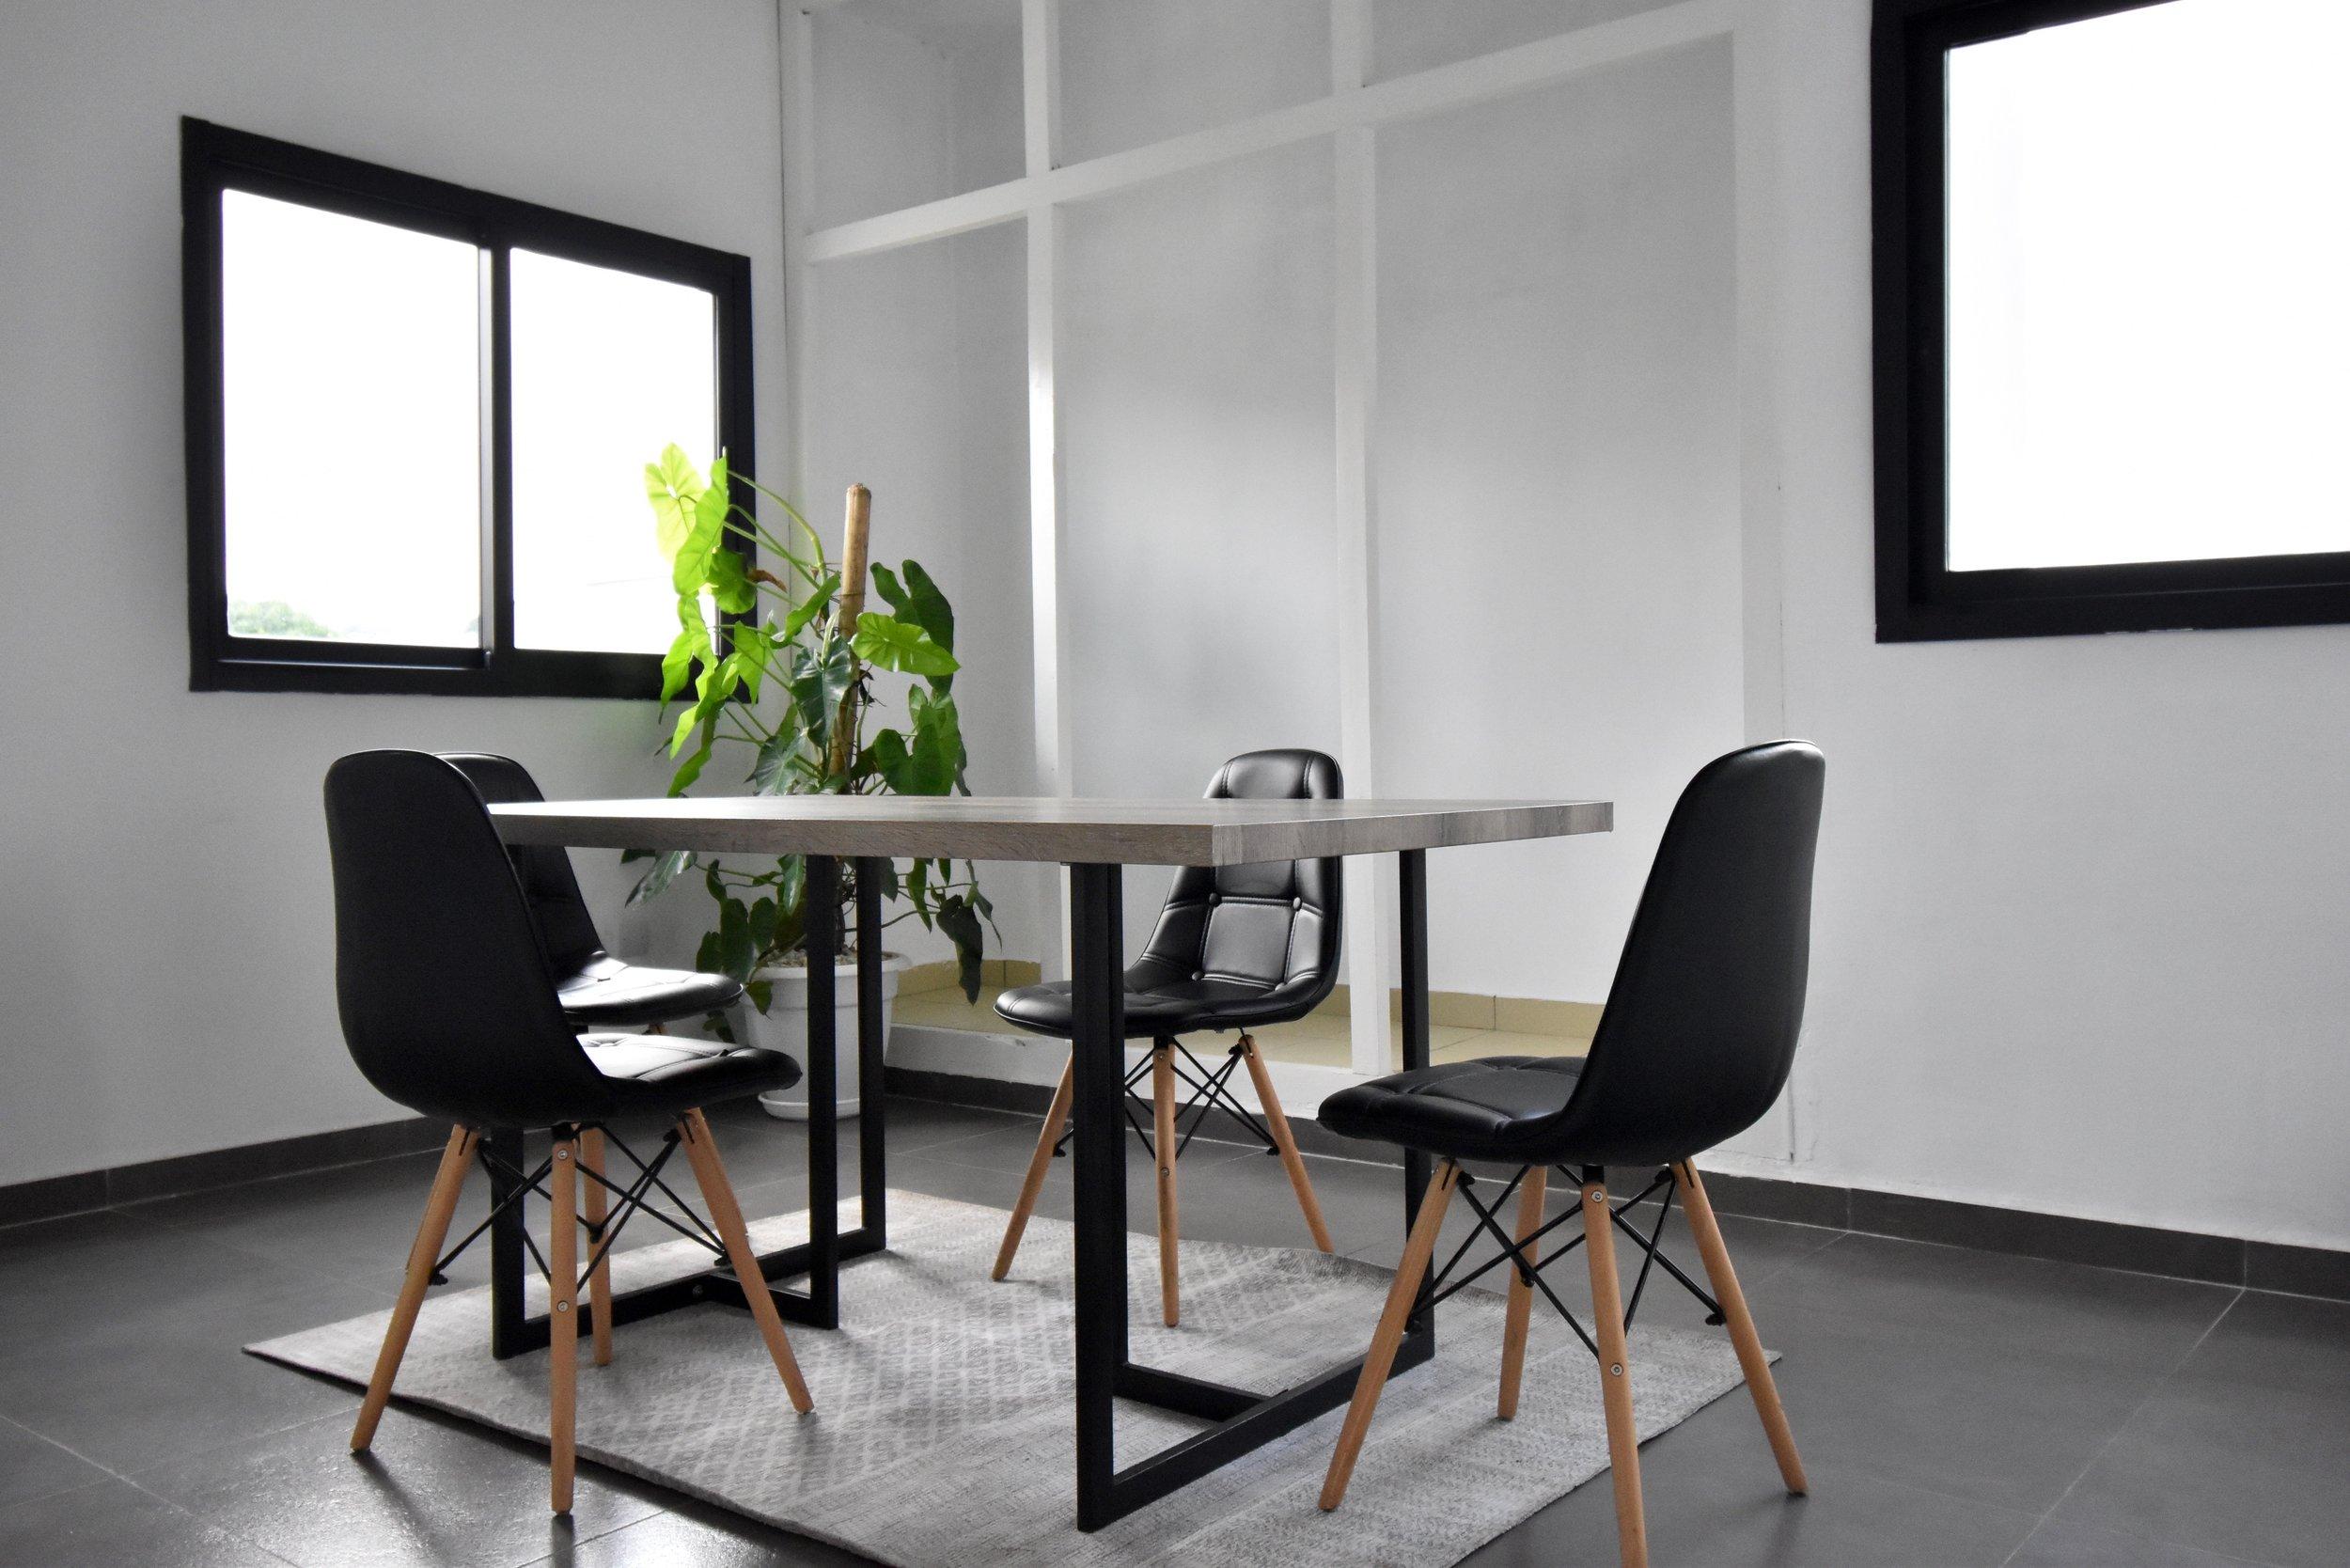 Le Phare Meeting Room - Abidjan